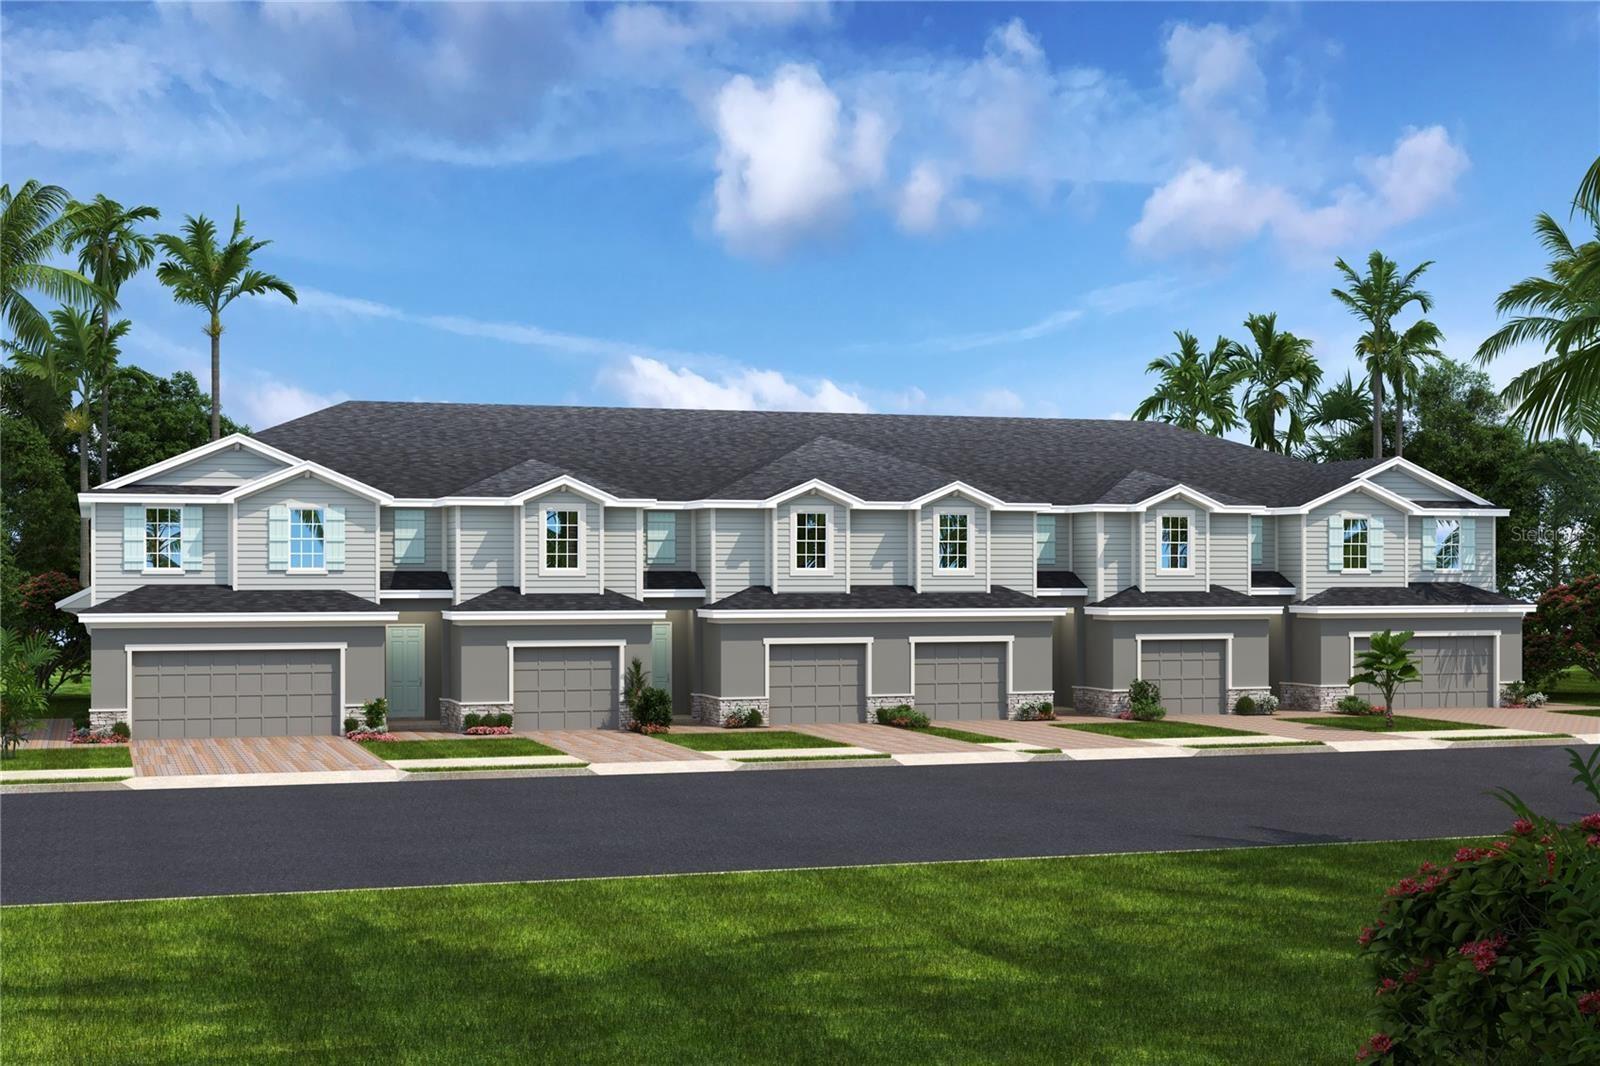 1919 HOLDEN RIDGE LANE, Minneola, FL 34715 - #: W7835103